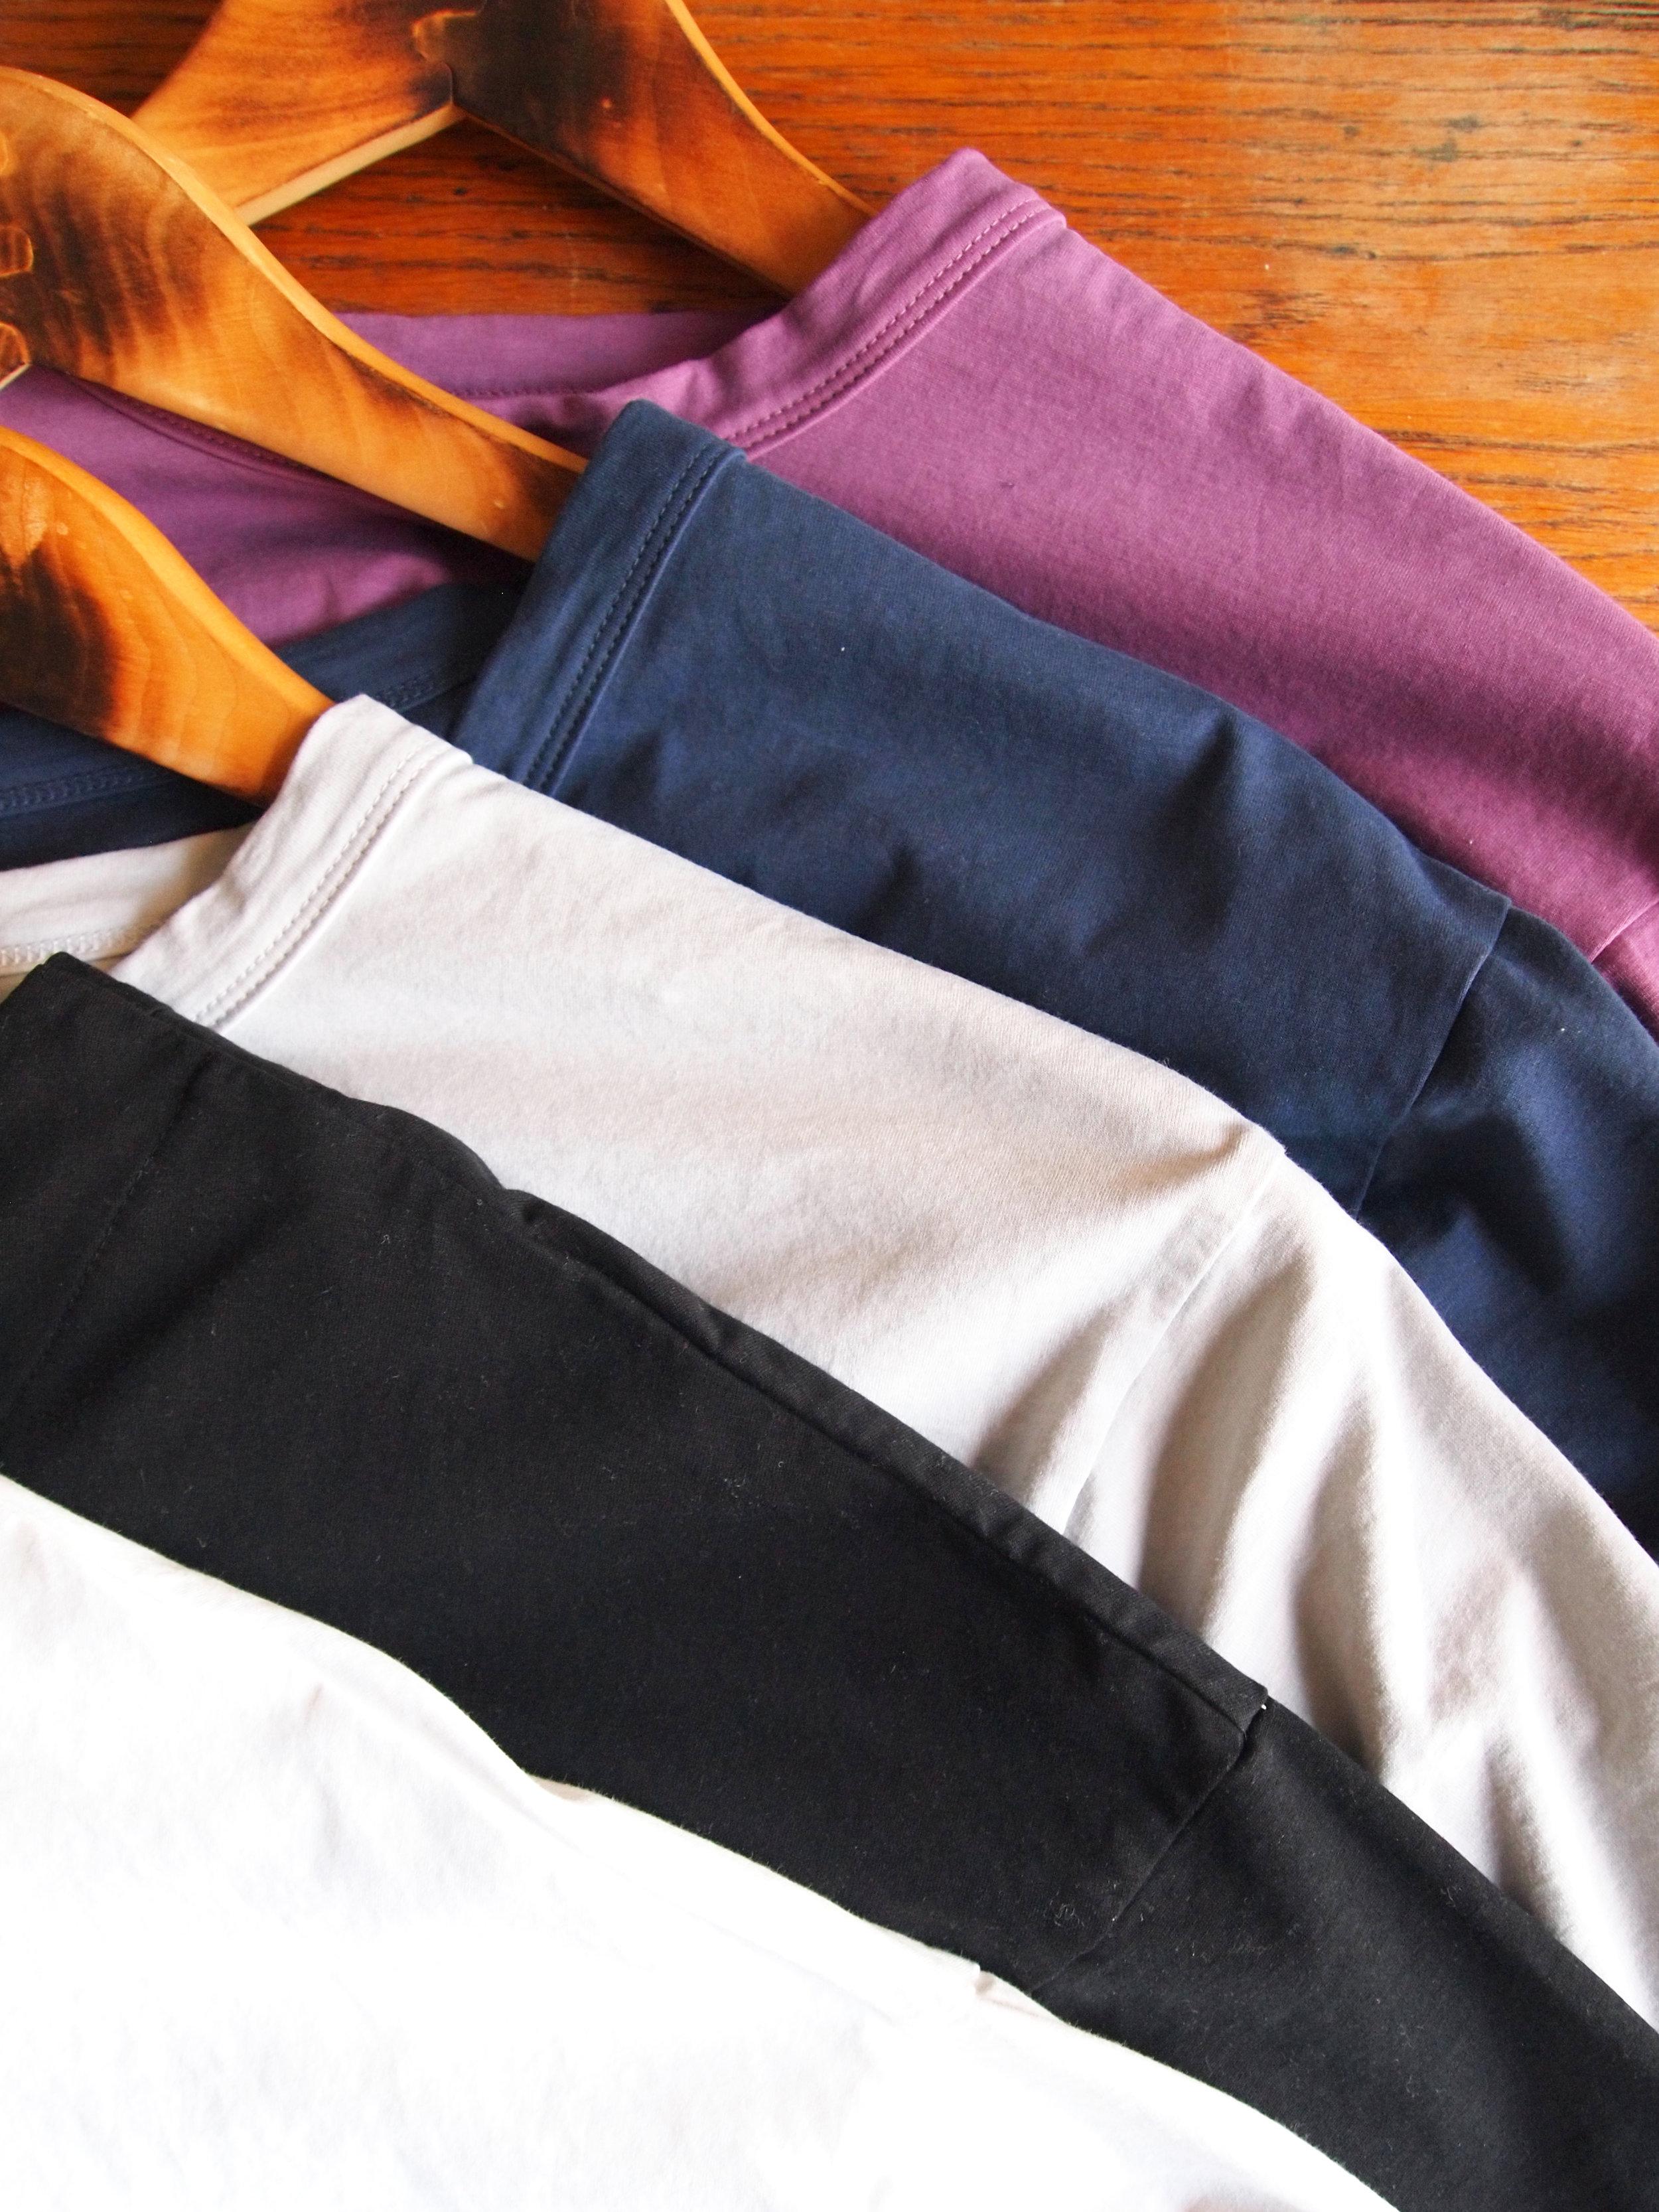 color; White, Black, Grey, Navy, Plum